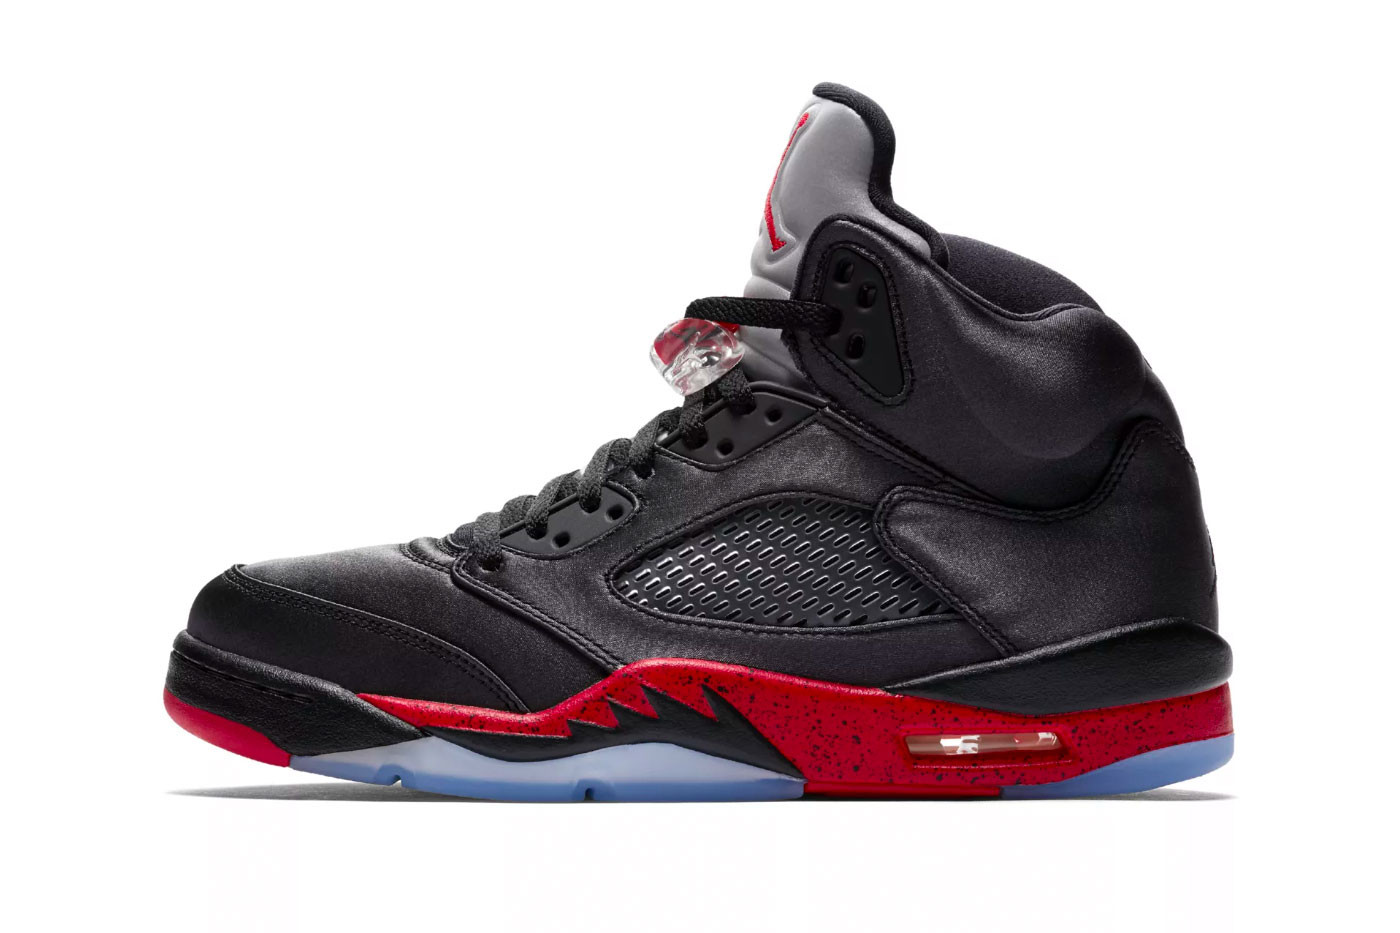 c451da914 Air Jordan 5 bred